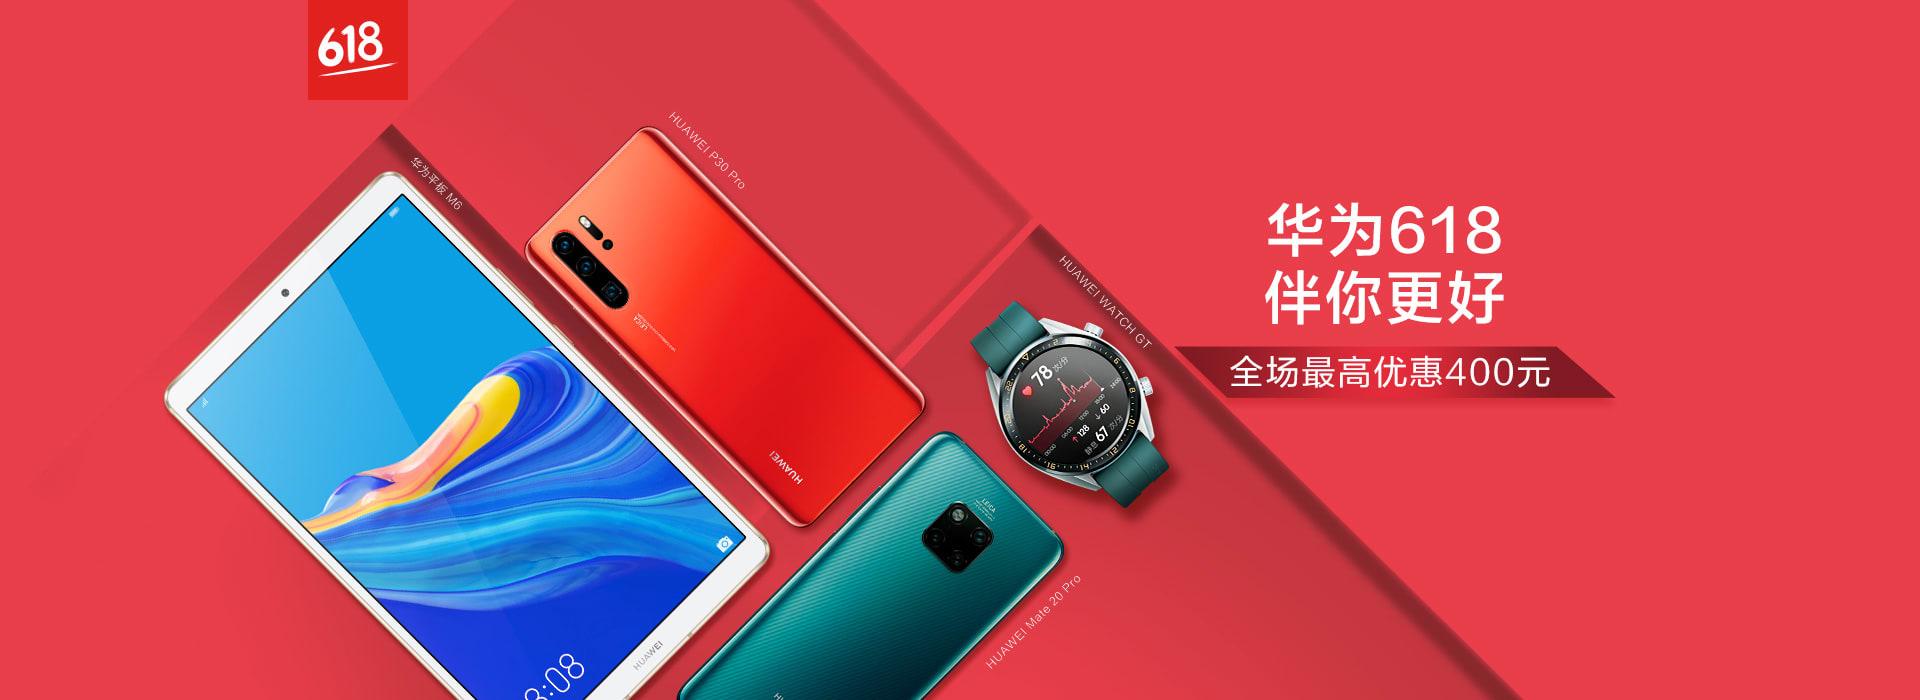 Huawei Nova 5 Pro Scores 315816 on AnTuTu